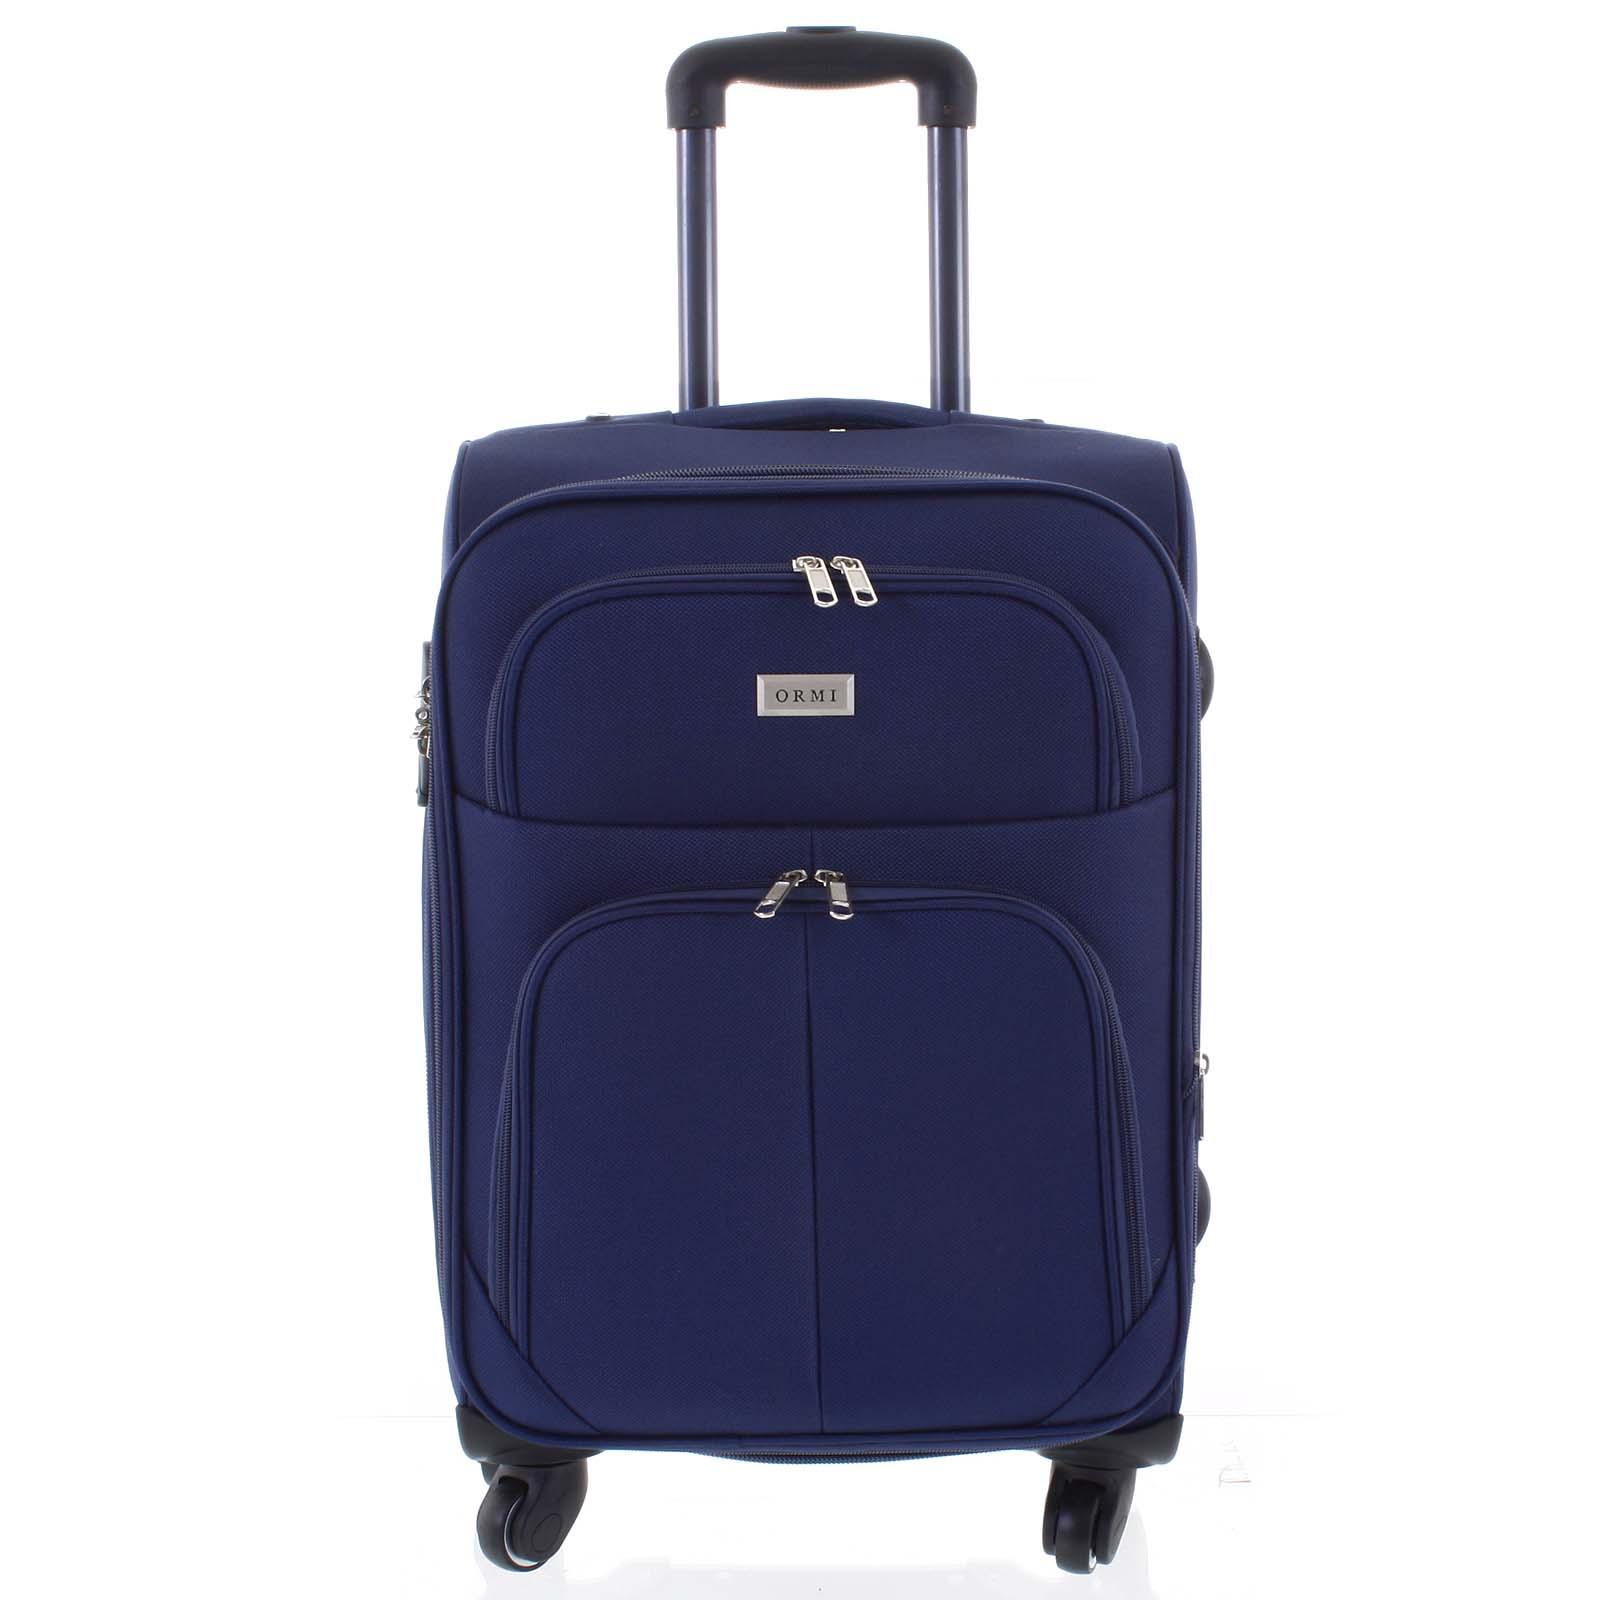 Cestovný kufor modrý - Ormi Tessa S modrá